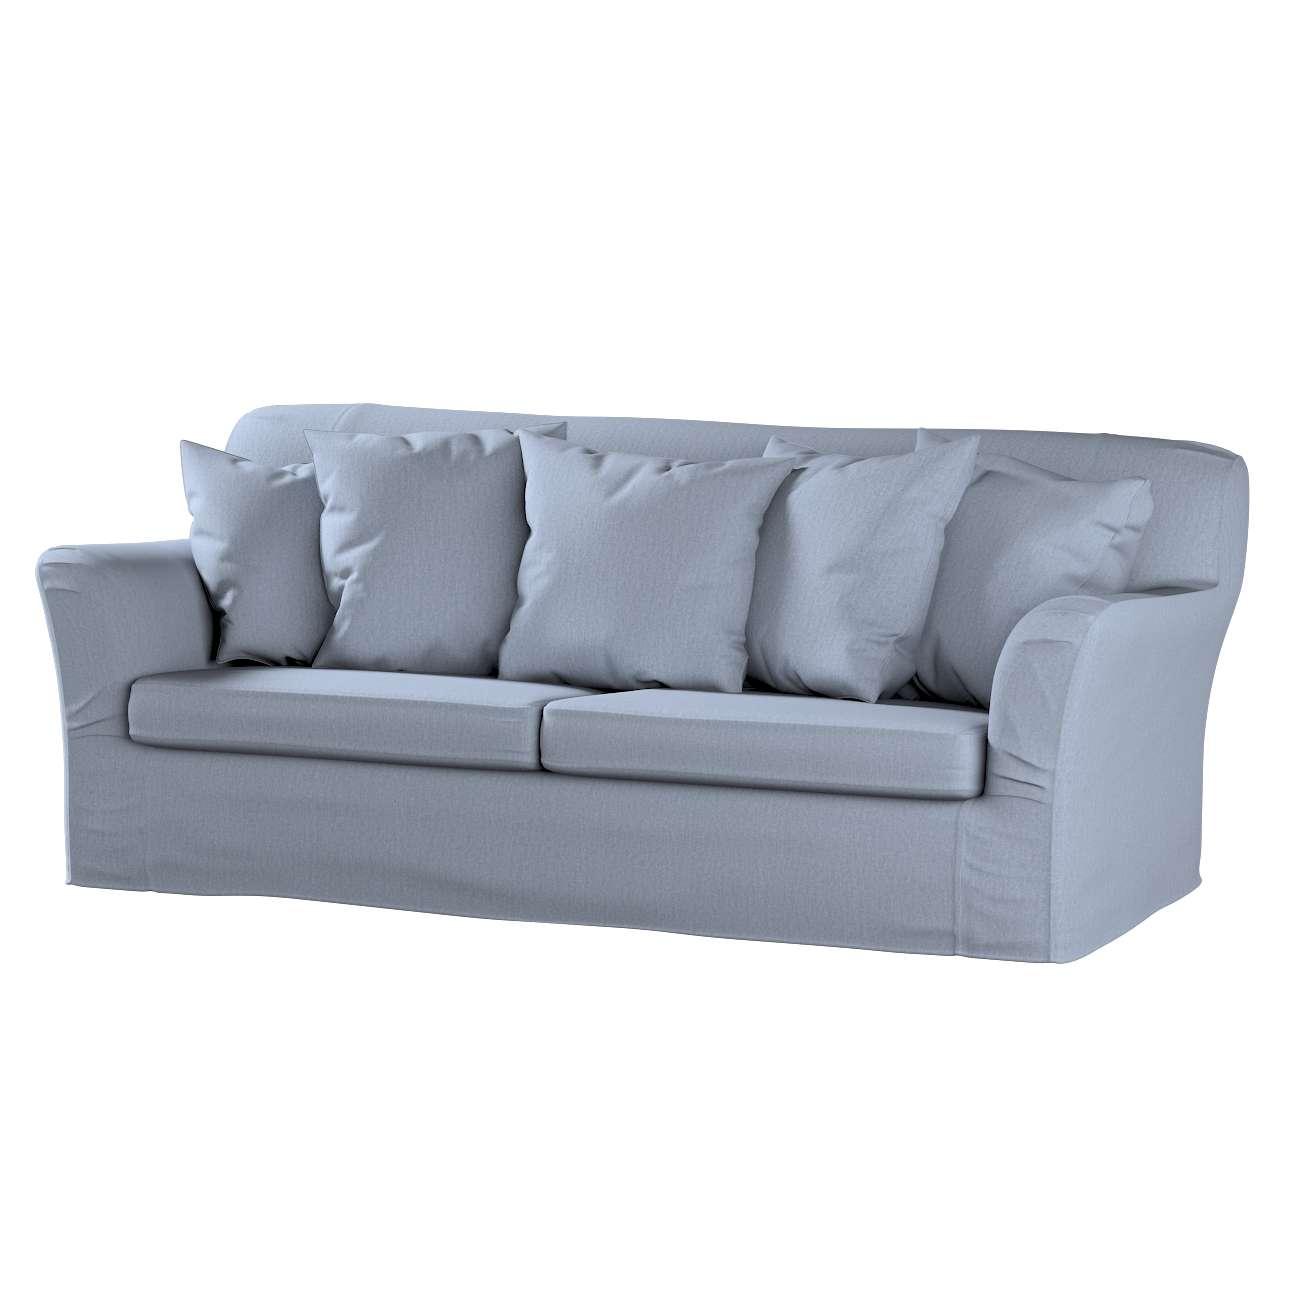 Ikea Blauwe Slaapbank.Ikea Zitbankhoes Overtrek Voor Tomelilla Slaapbank Zilver Blauw